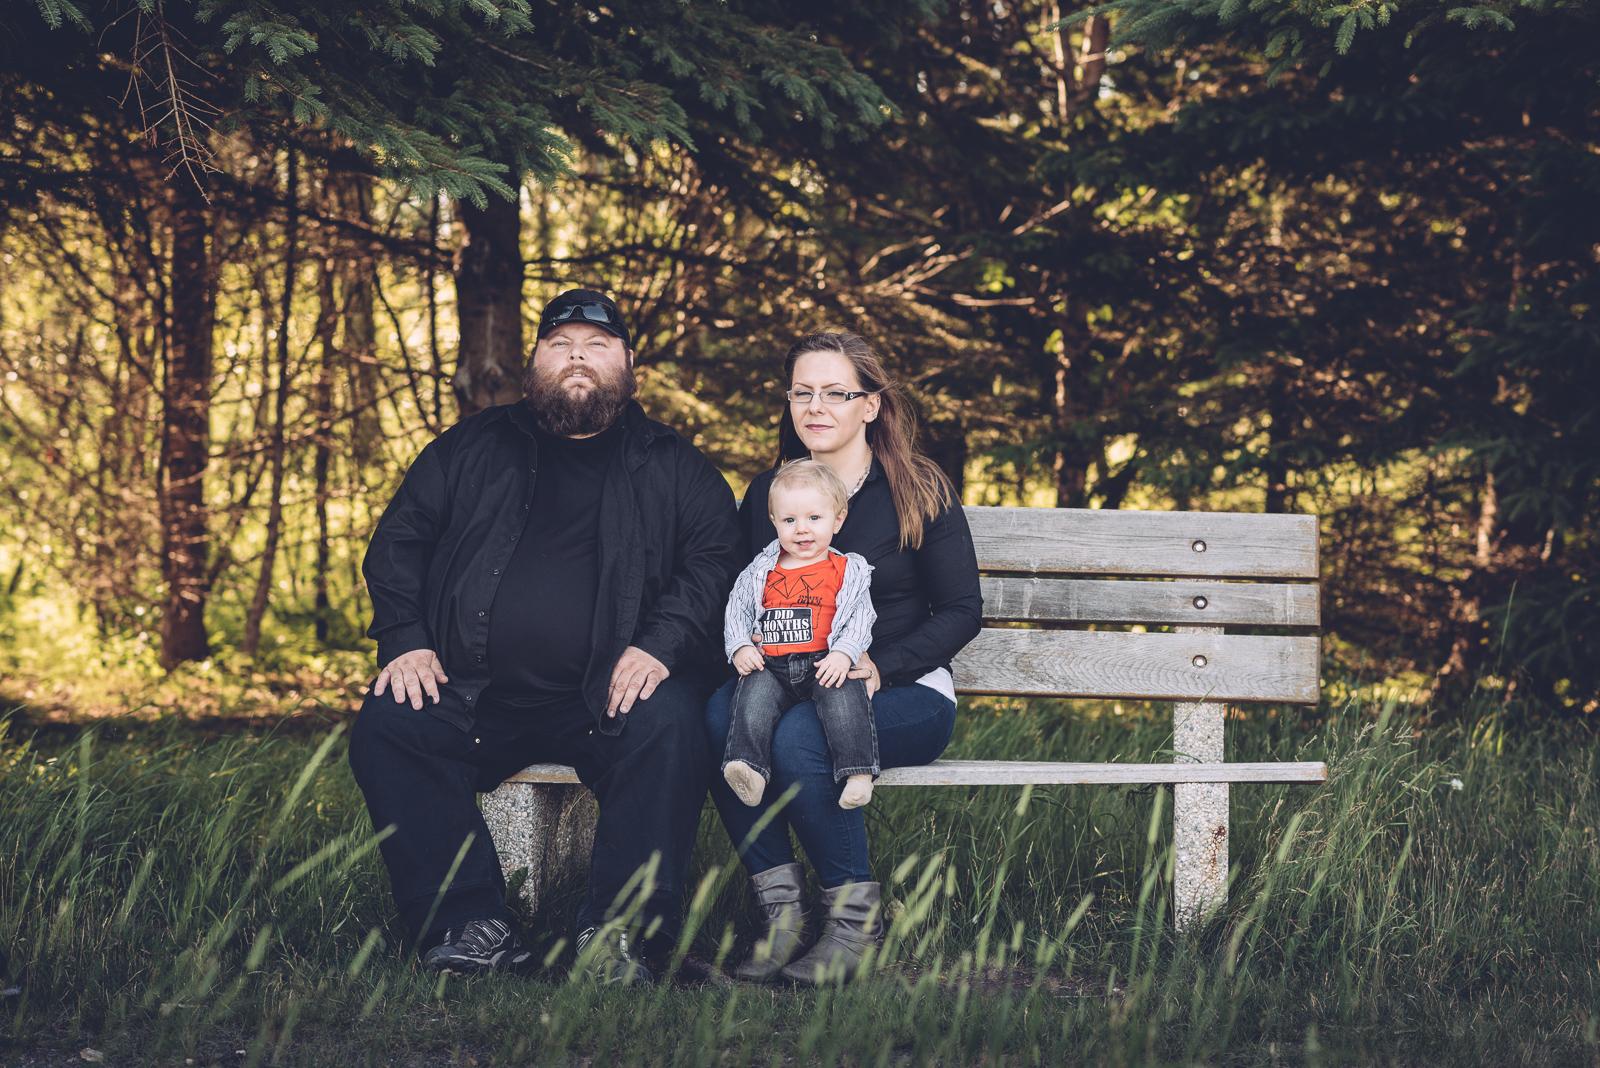 amanda_family_portraits_blog6.jpg